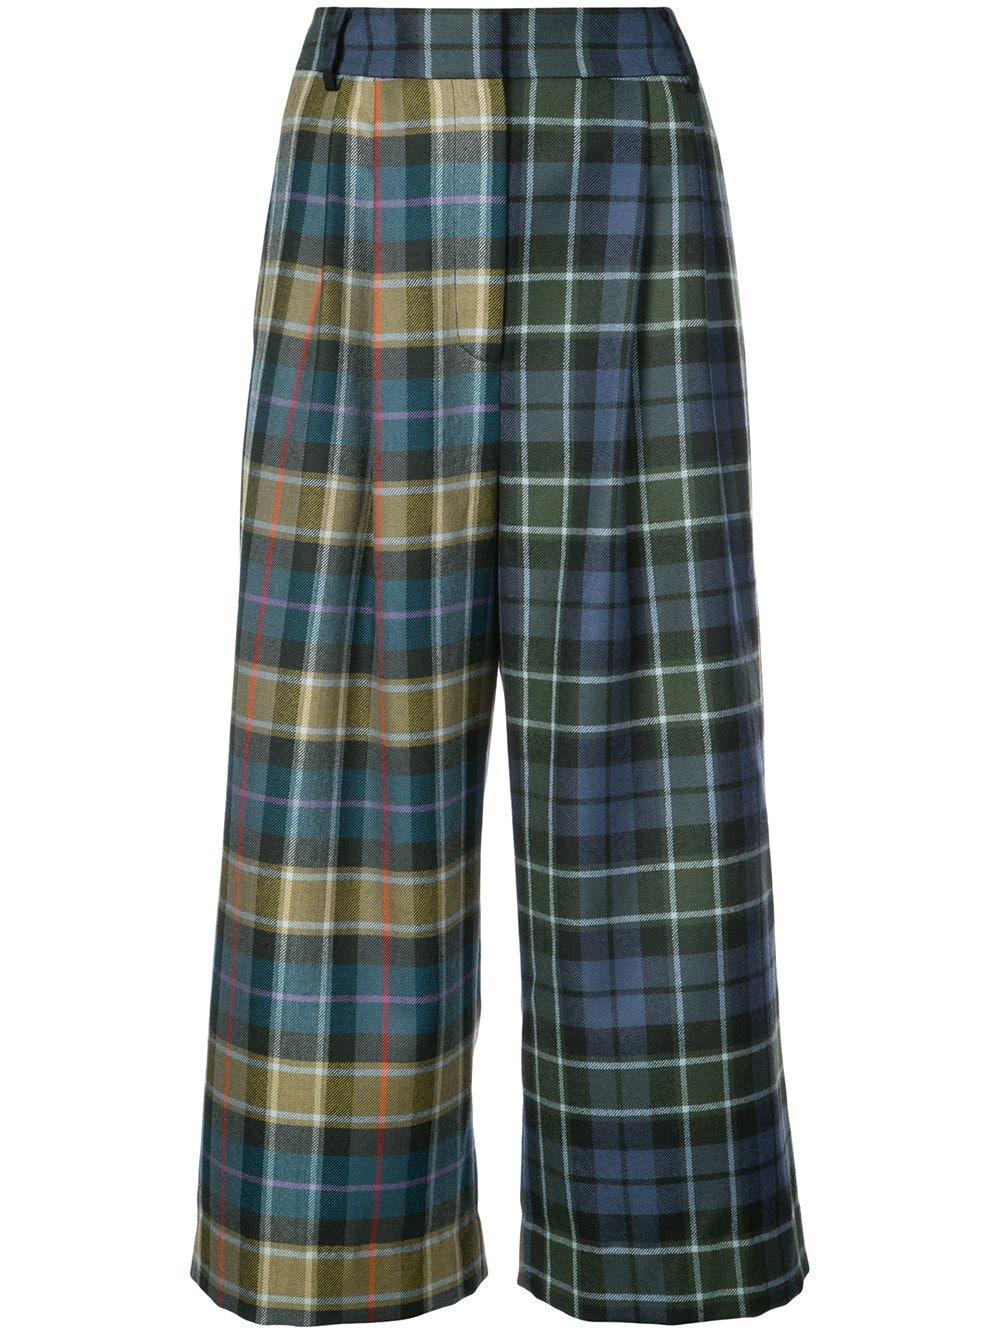 Tibi Tartan Stella Cropped Trousers - Green